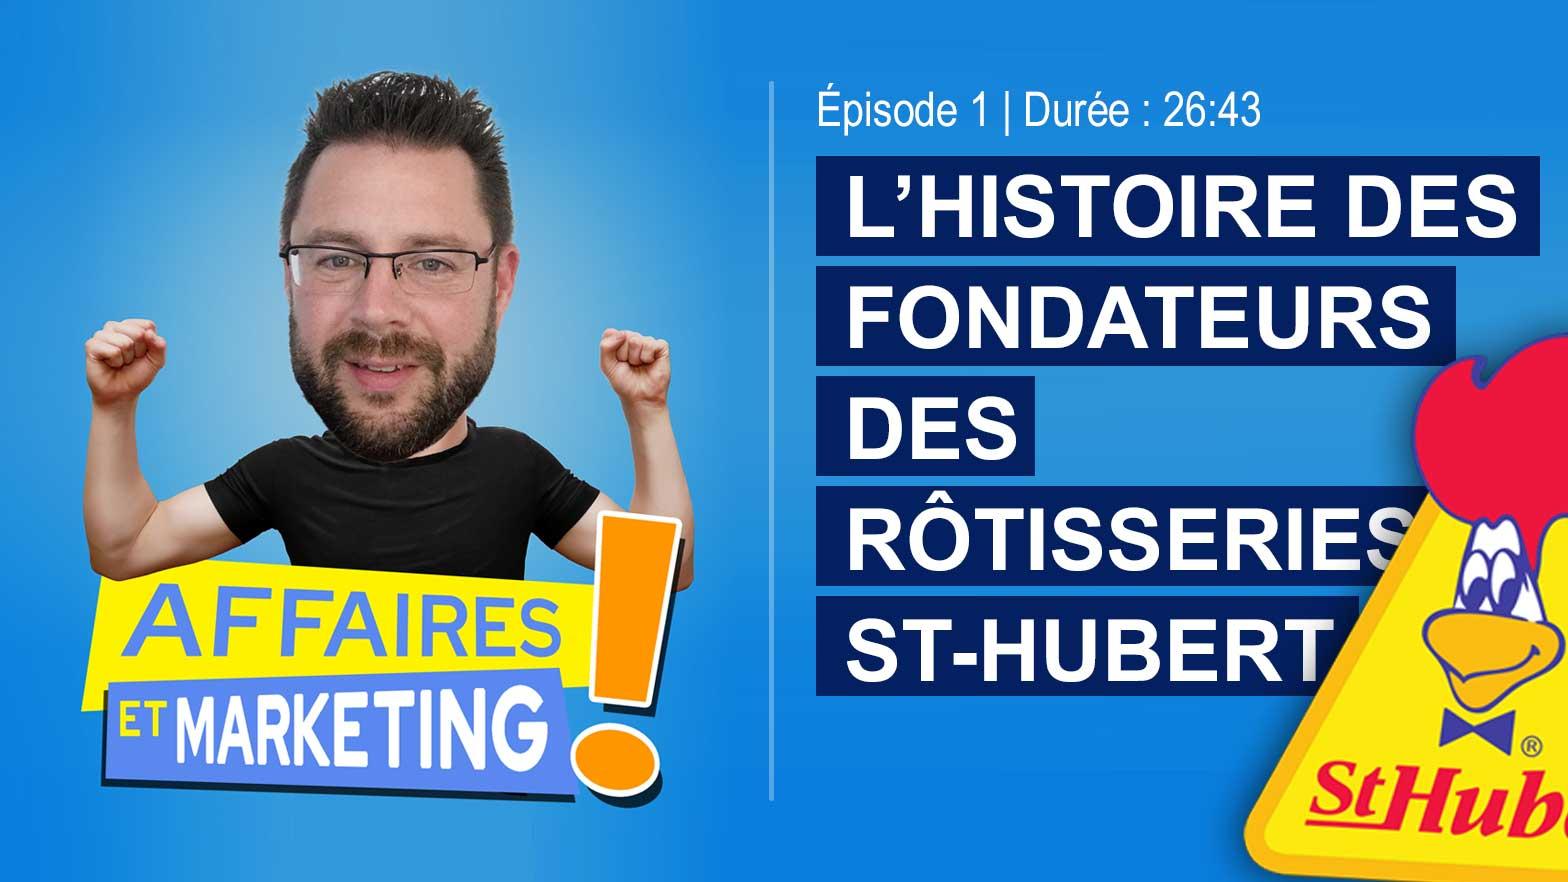 Podcast : Histoire des rôtisseries St-Hubert